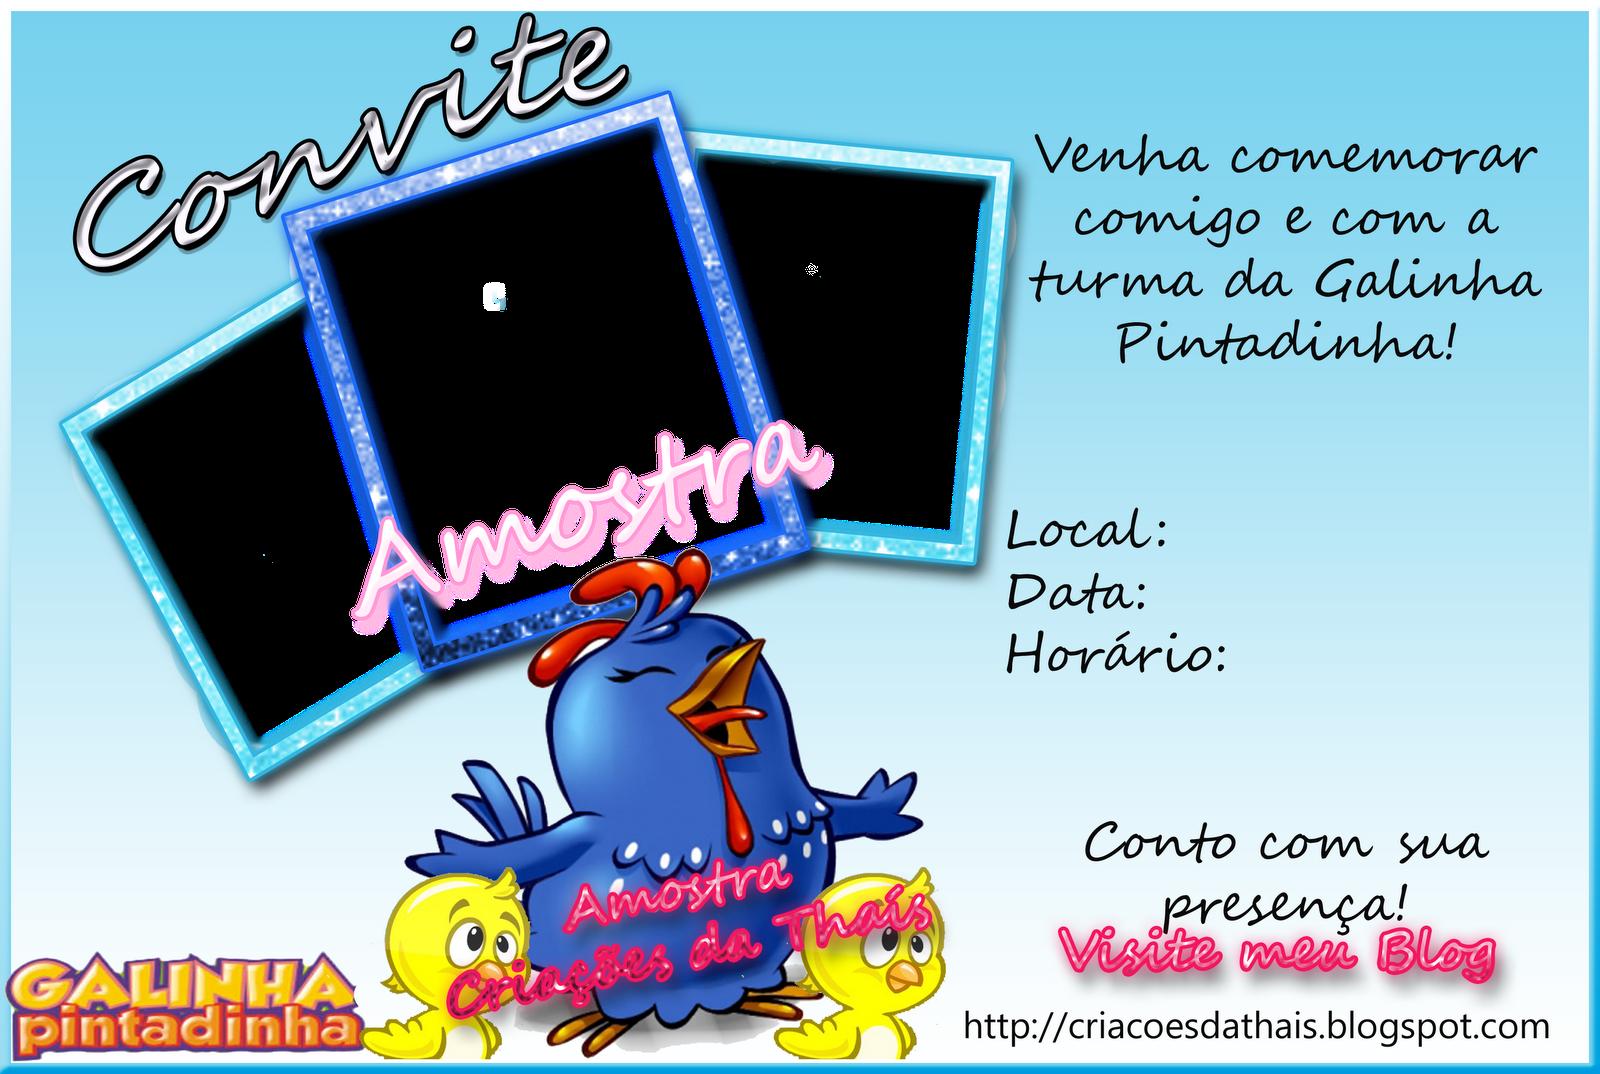 Convite De Aniversario Da Galinha Pintadinha